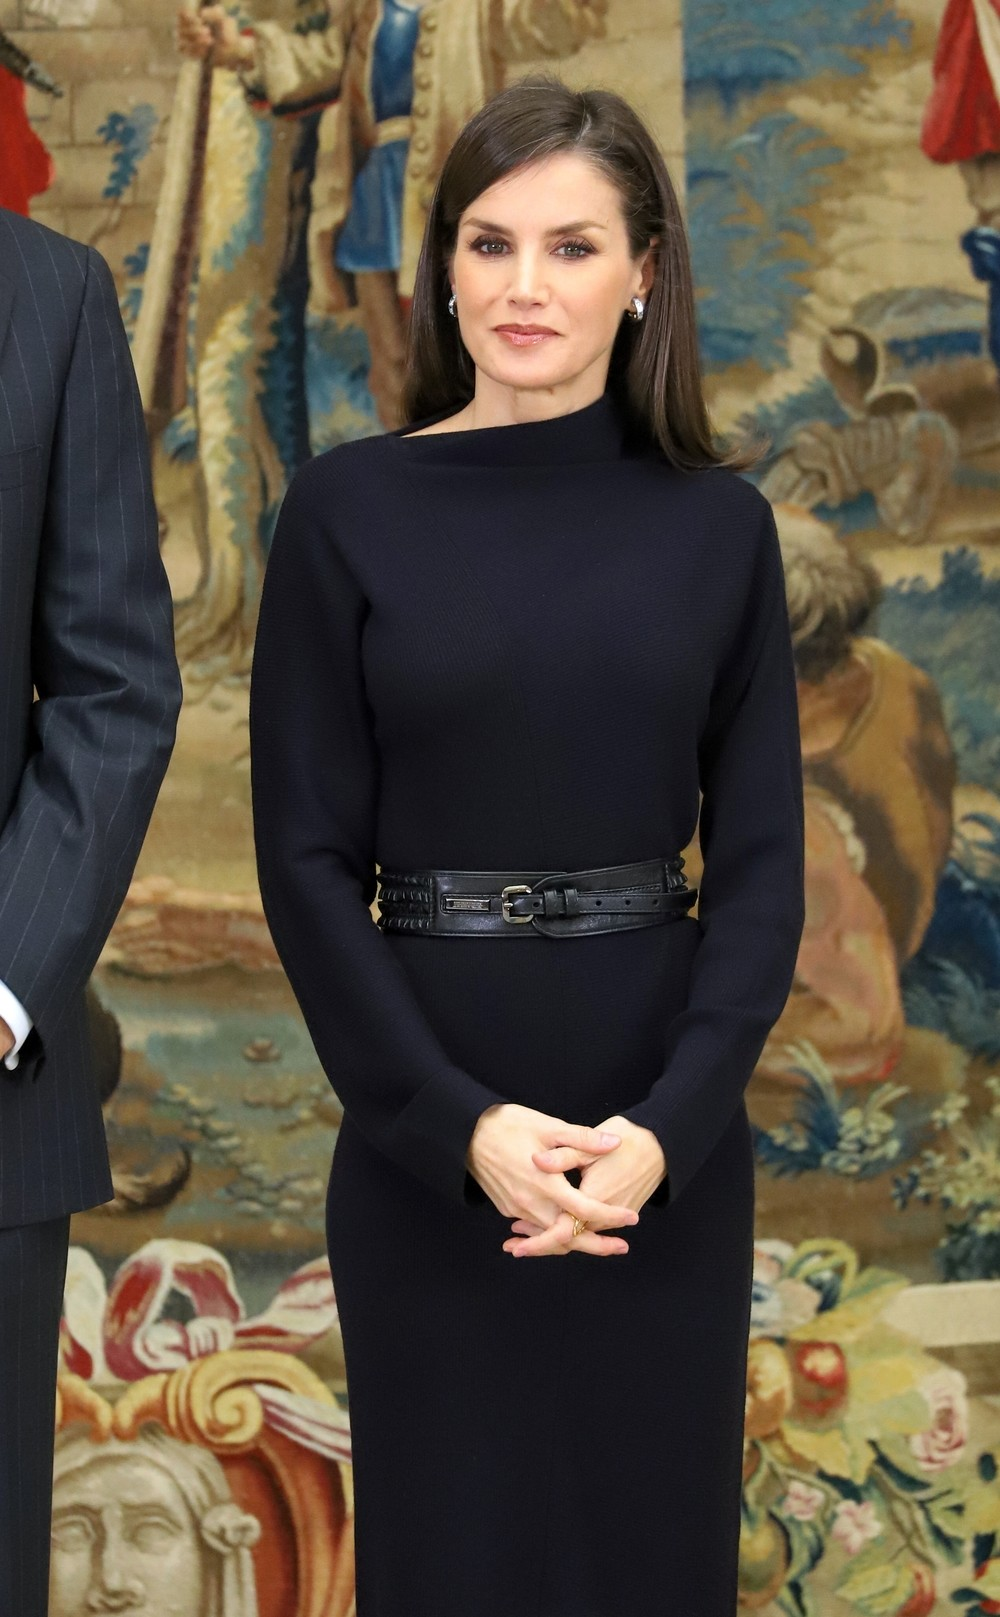 La Reina Letizia deslumbra en color negro